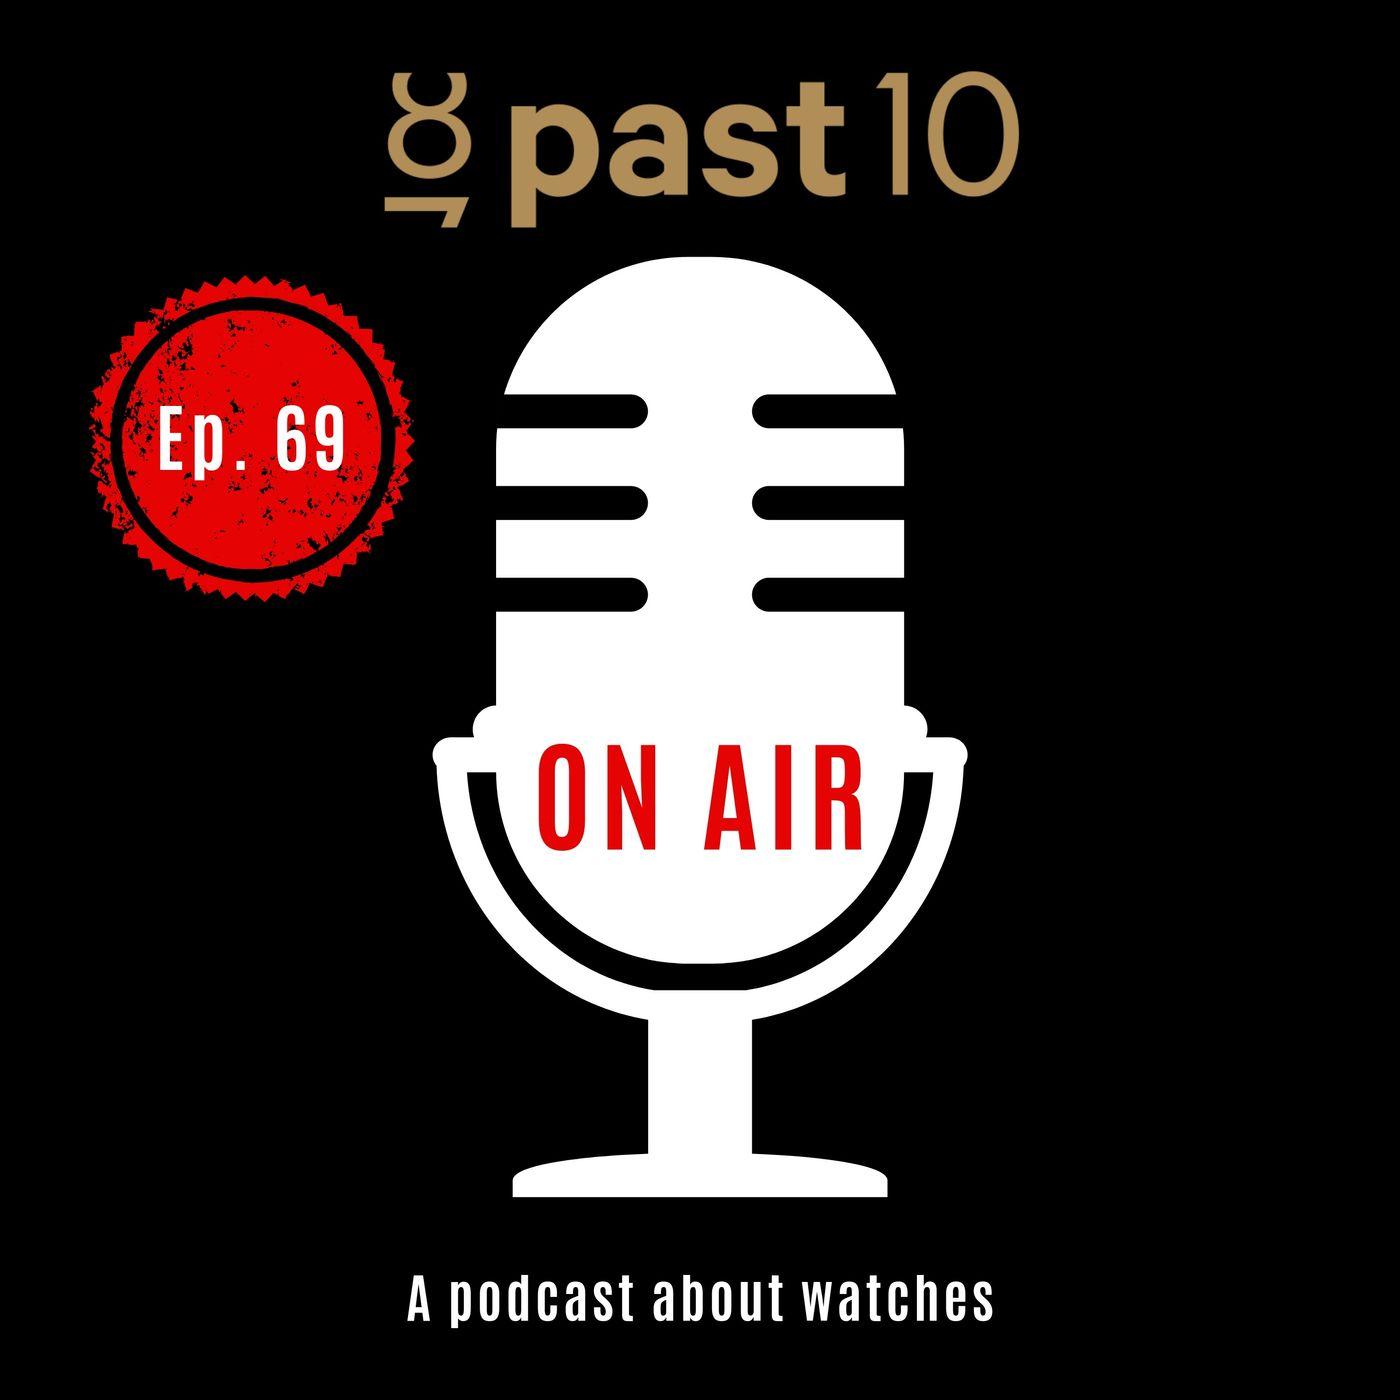 Episode 69 - The Magic Of F.P Journe